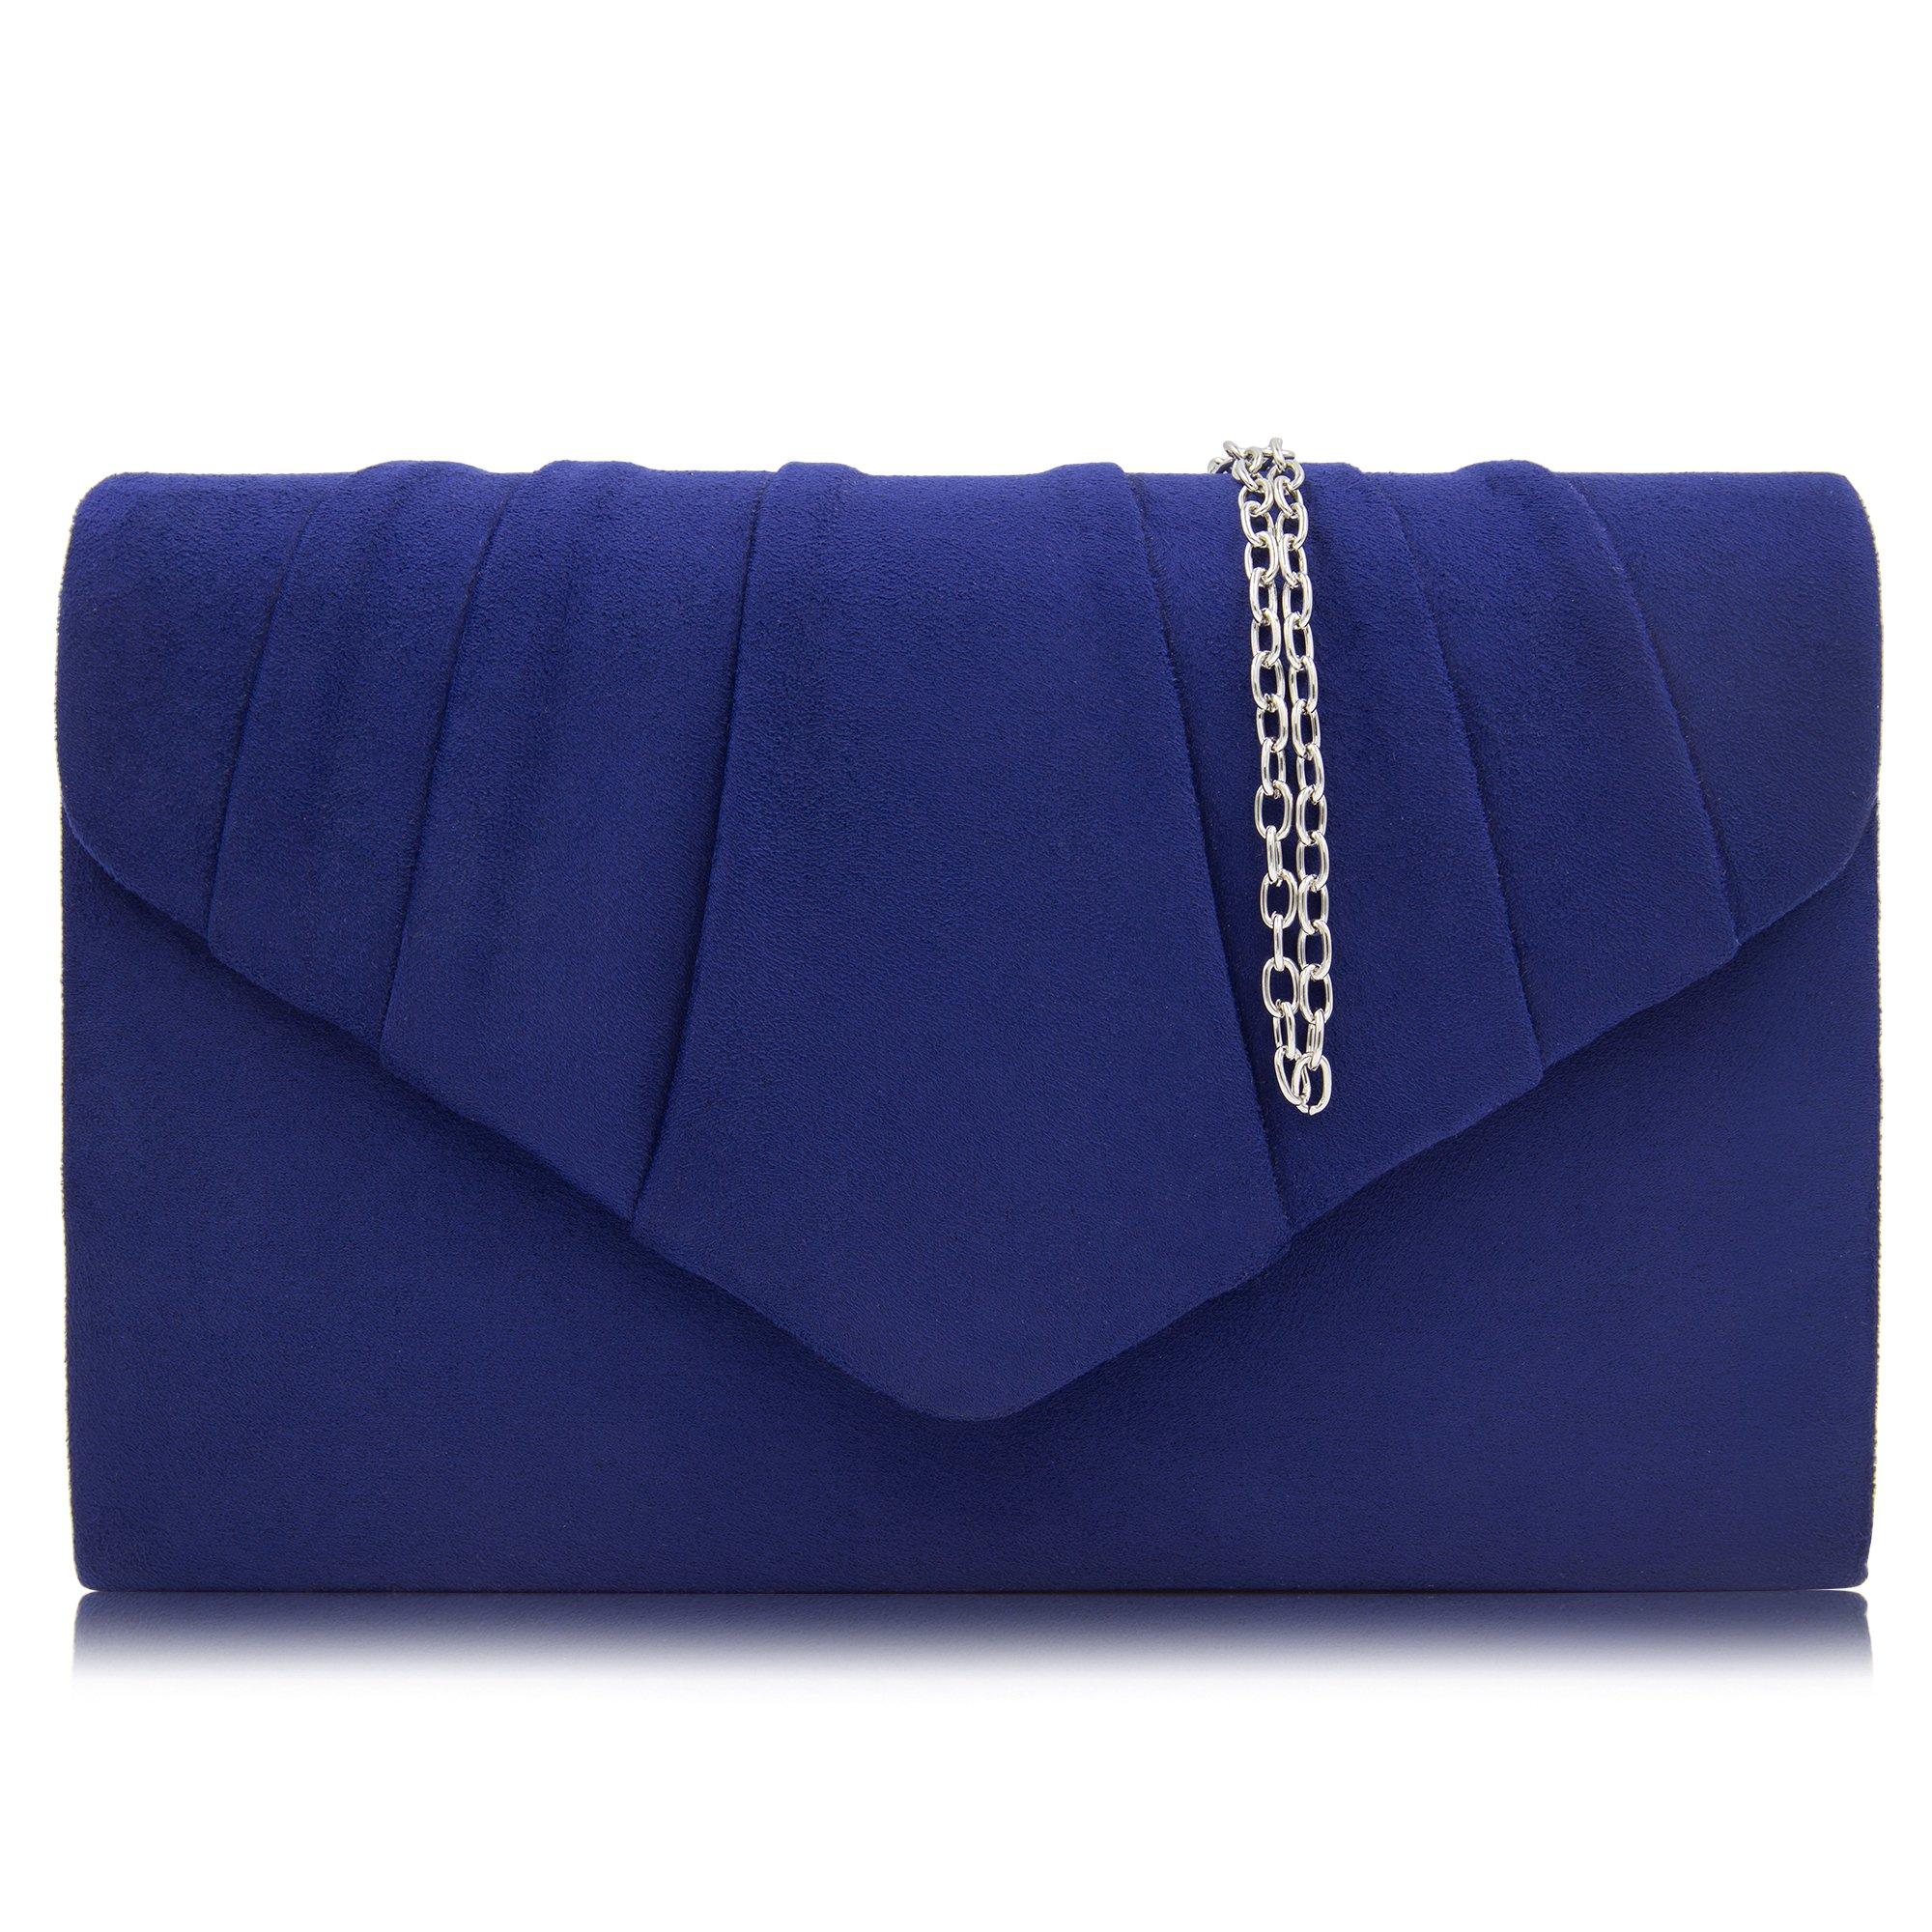 Milisente Women Clutches Velvet Pleated Evening Bag Evenlope Clutch Purse (Blue)